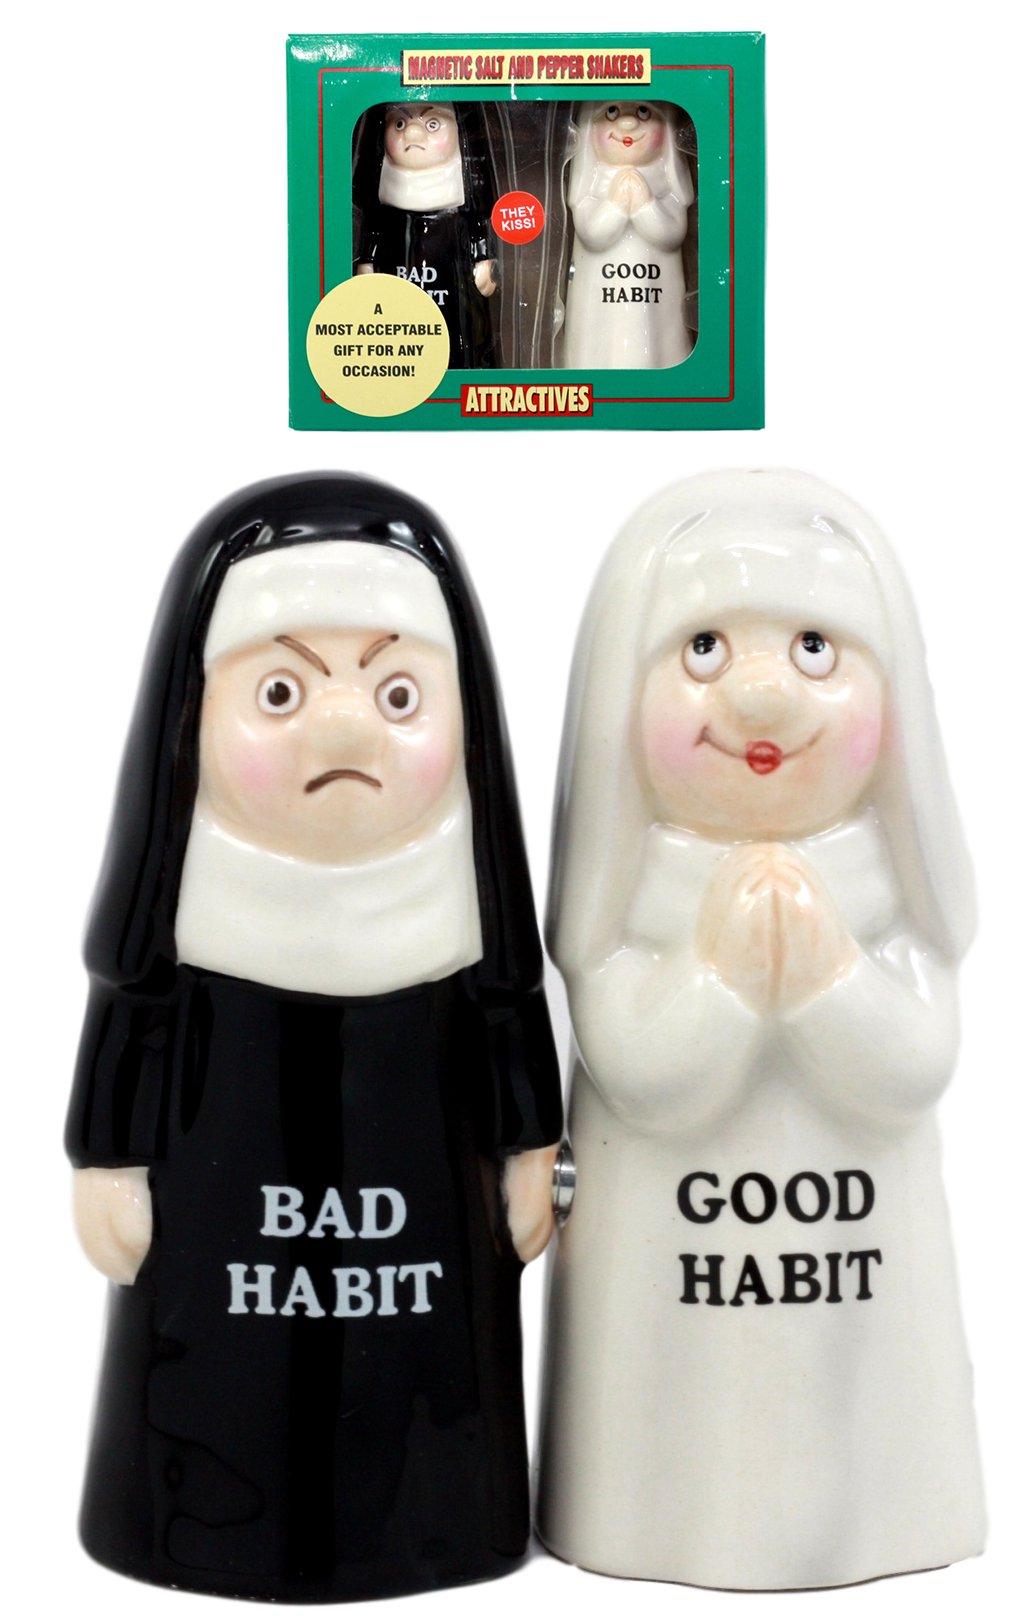 Ebros Gift Good Habits Nun Or Bad Habits Nun Salt & Pepper Shakers Ceramic Magnetic Figurine Set 4''H